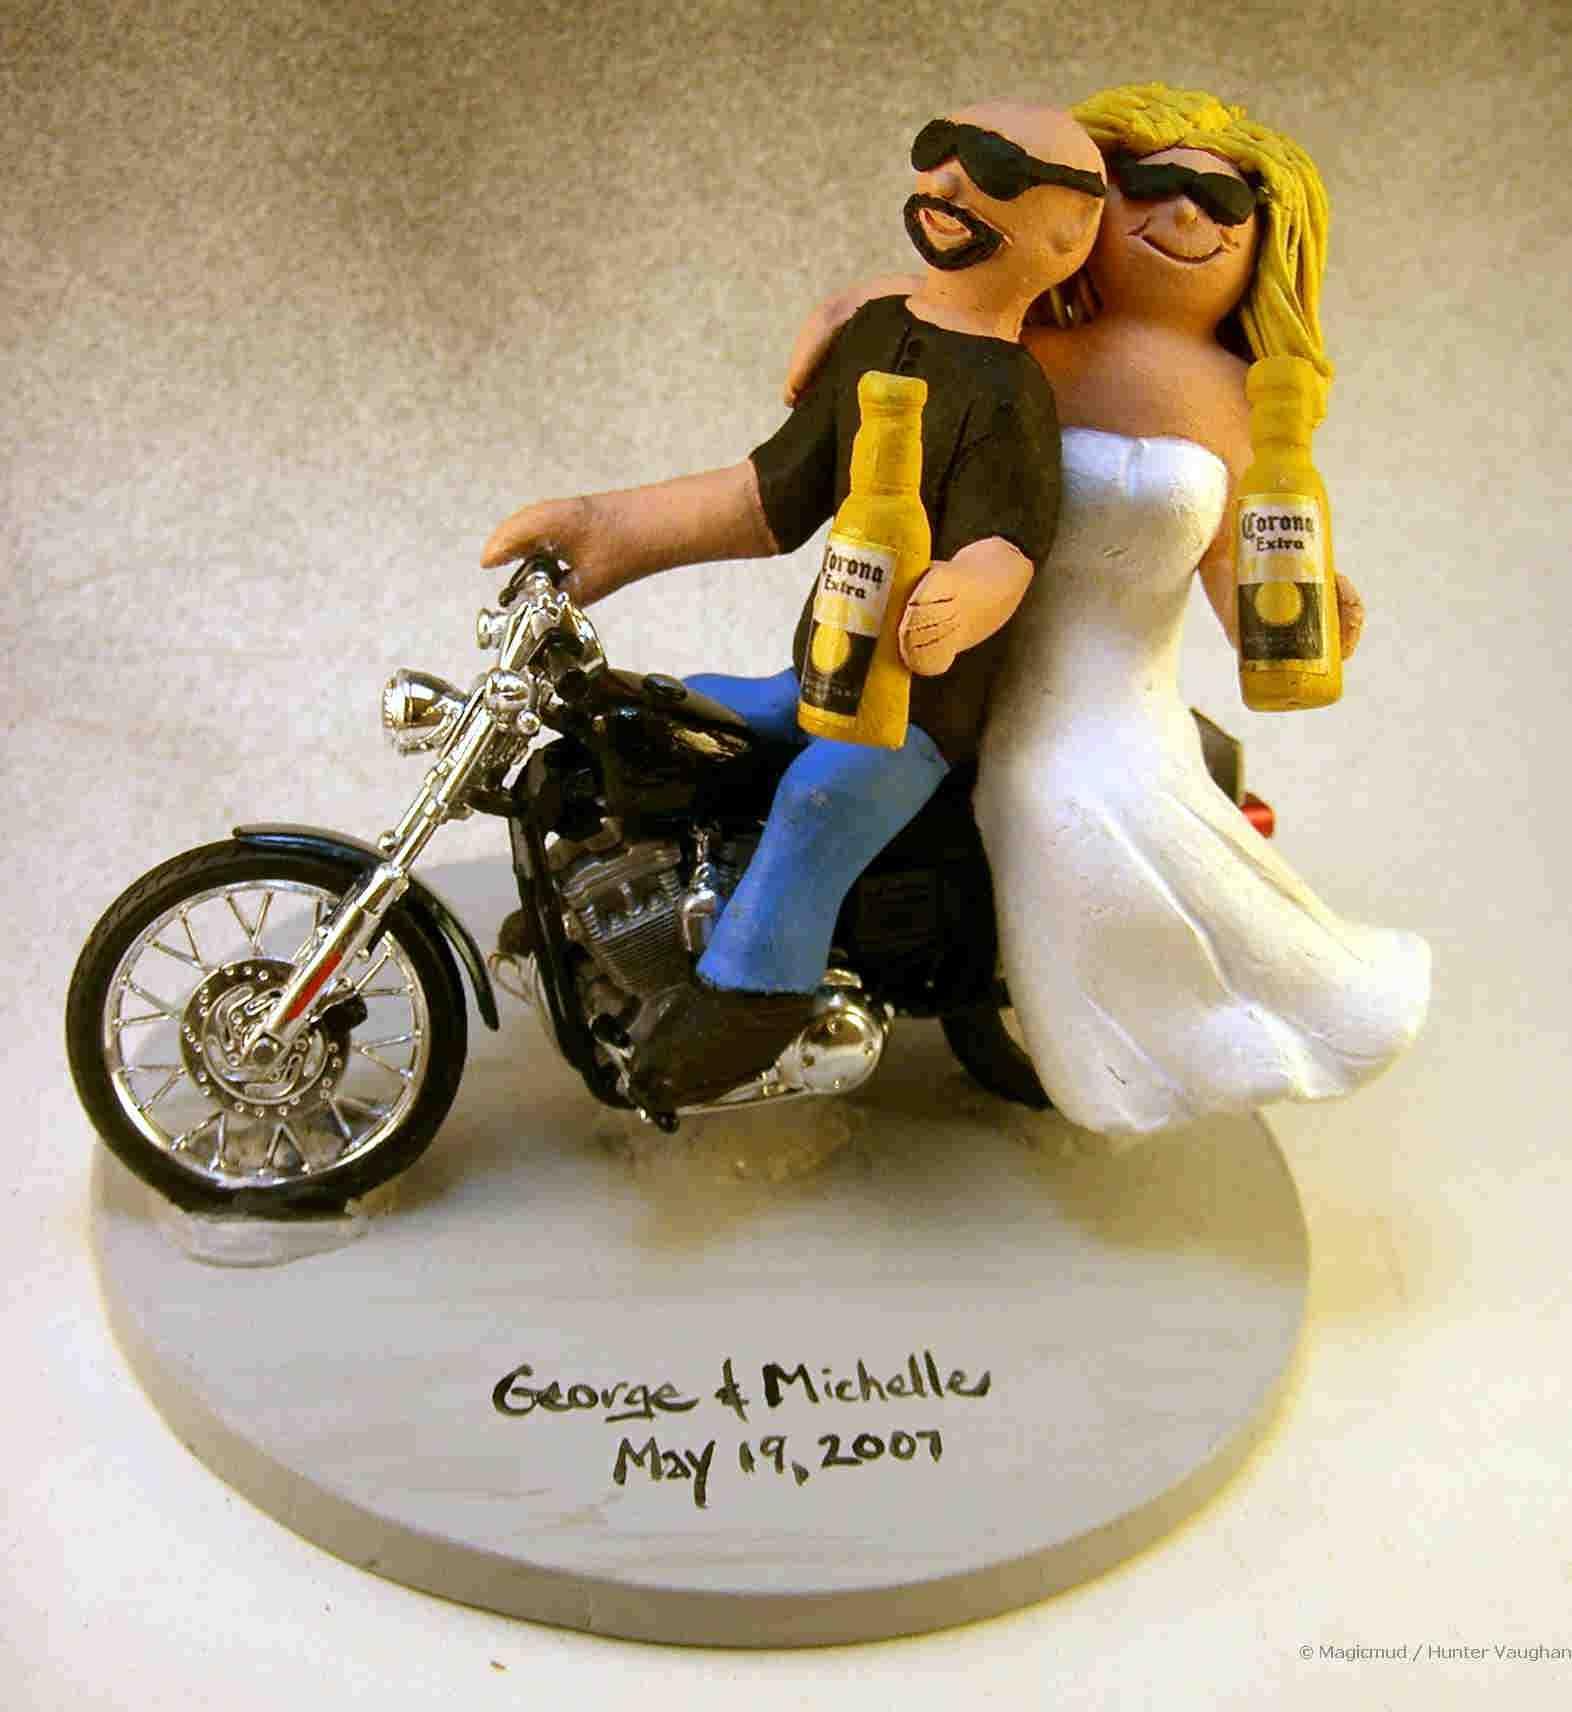 sportbike motorcycle wedding cake topper wedding cake toppers funny Motorcycle Rider S Wedding Cake Topper